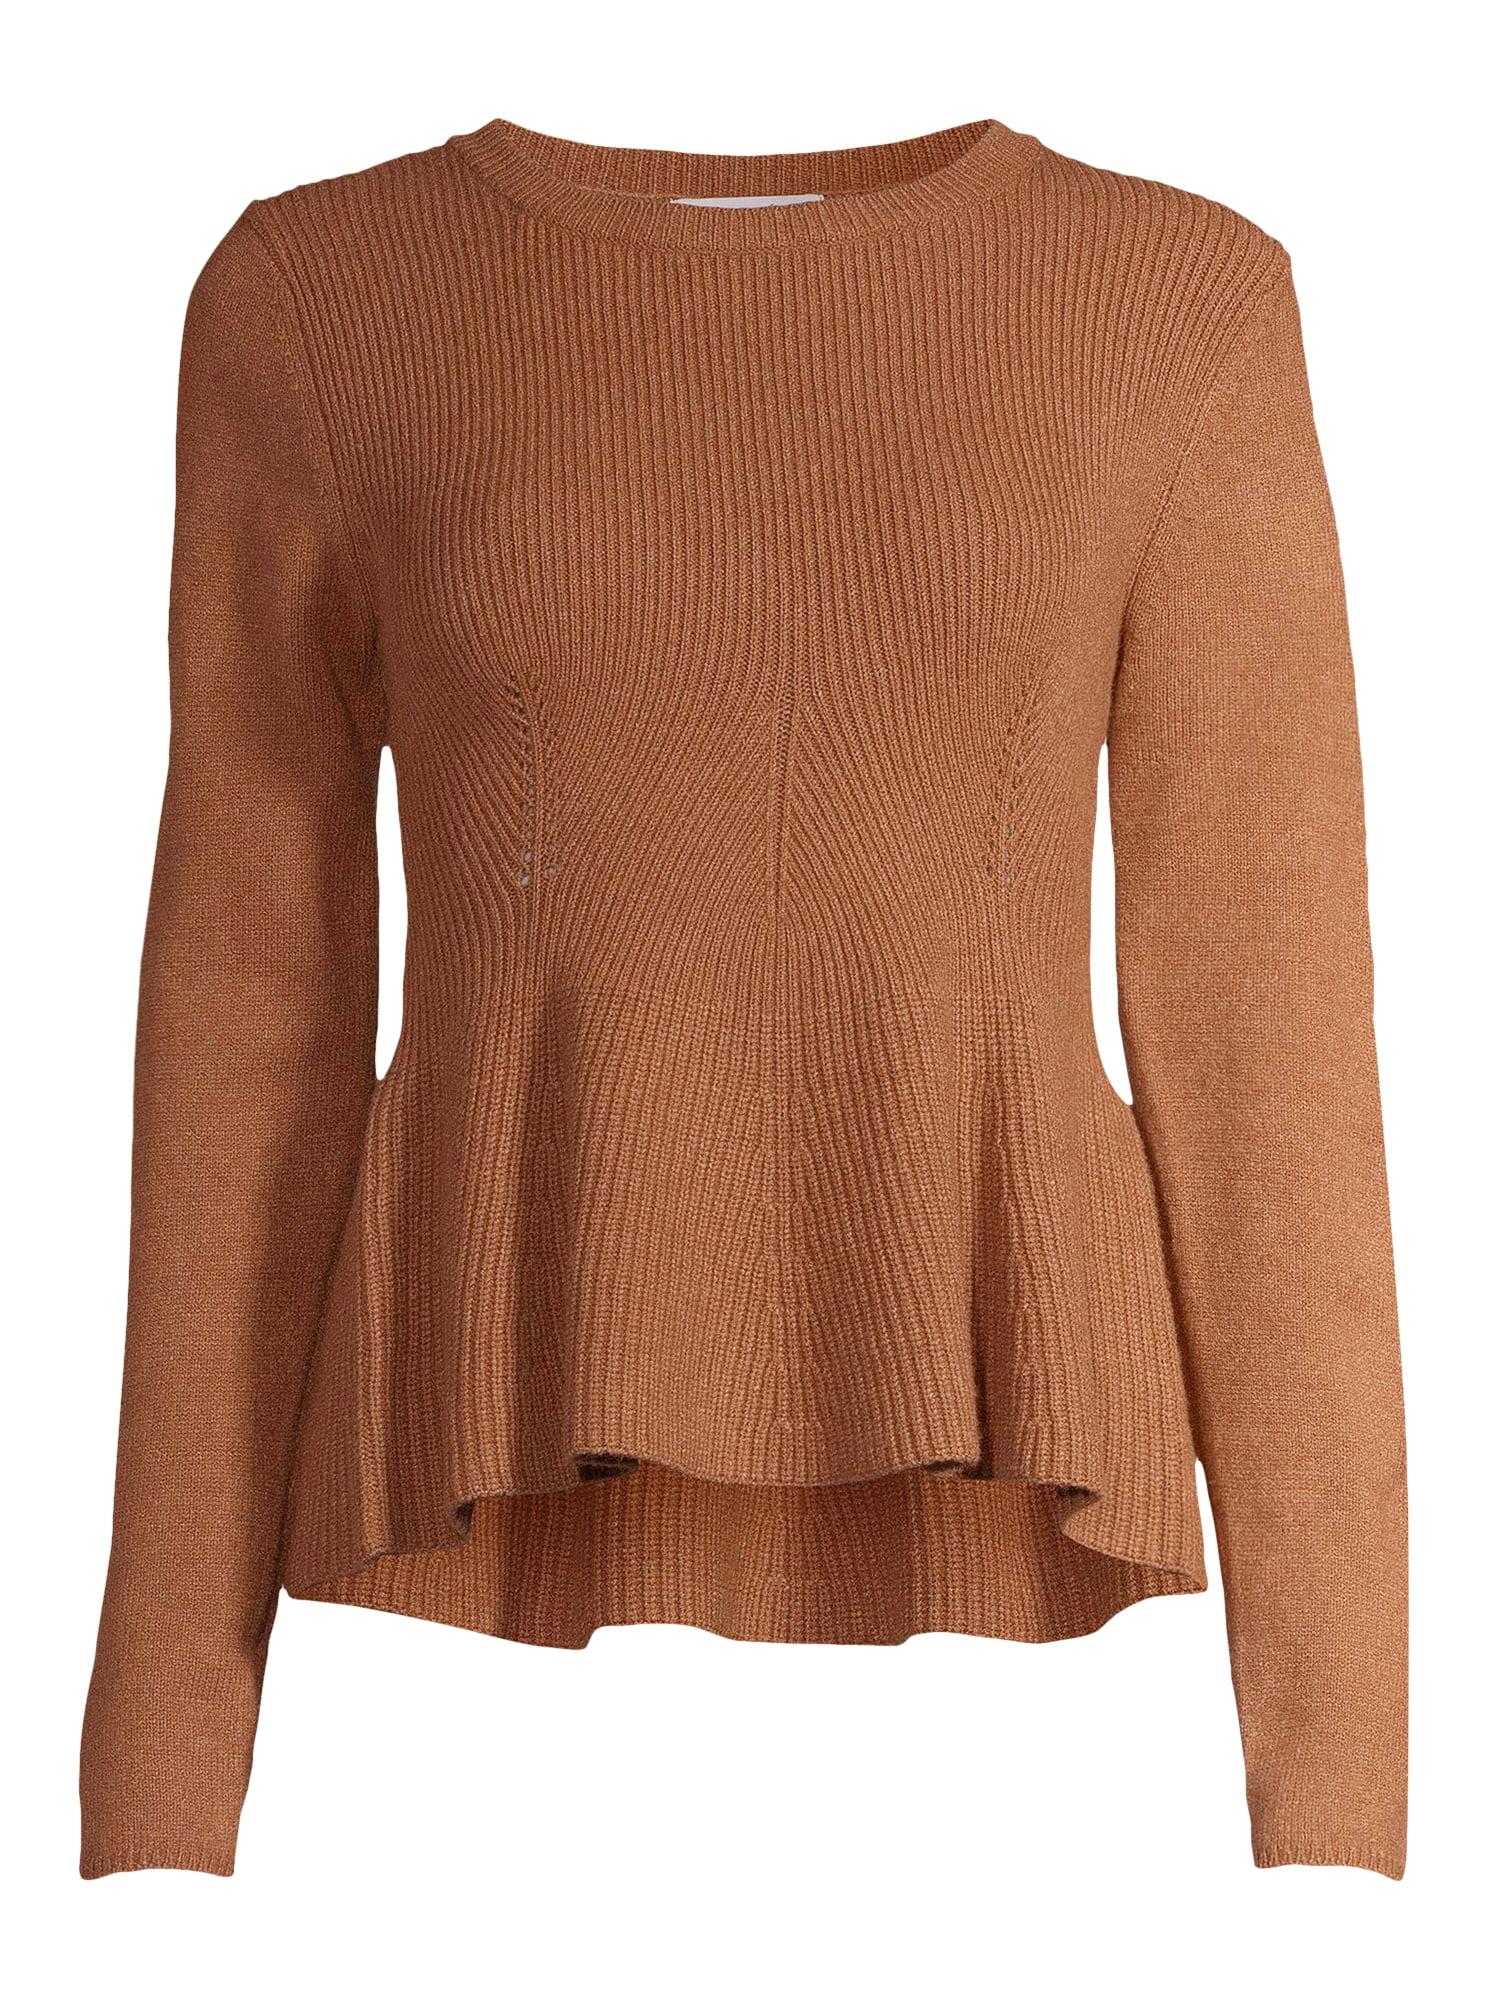 Sofia Jeans by Sofia Vergara Women's Crewneck Peplum Sweater